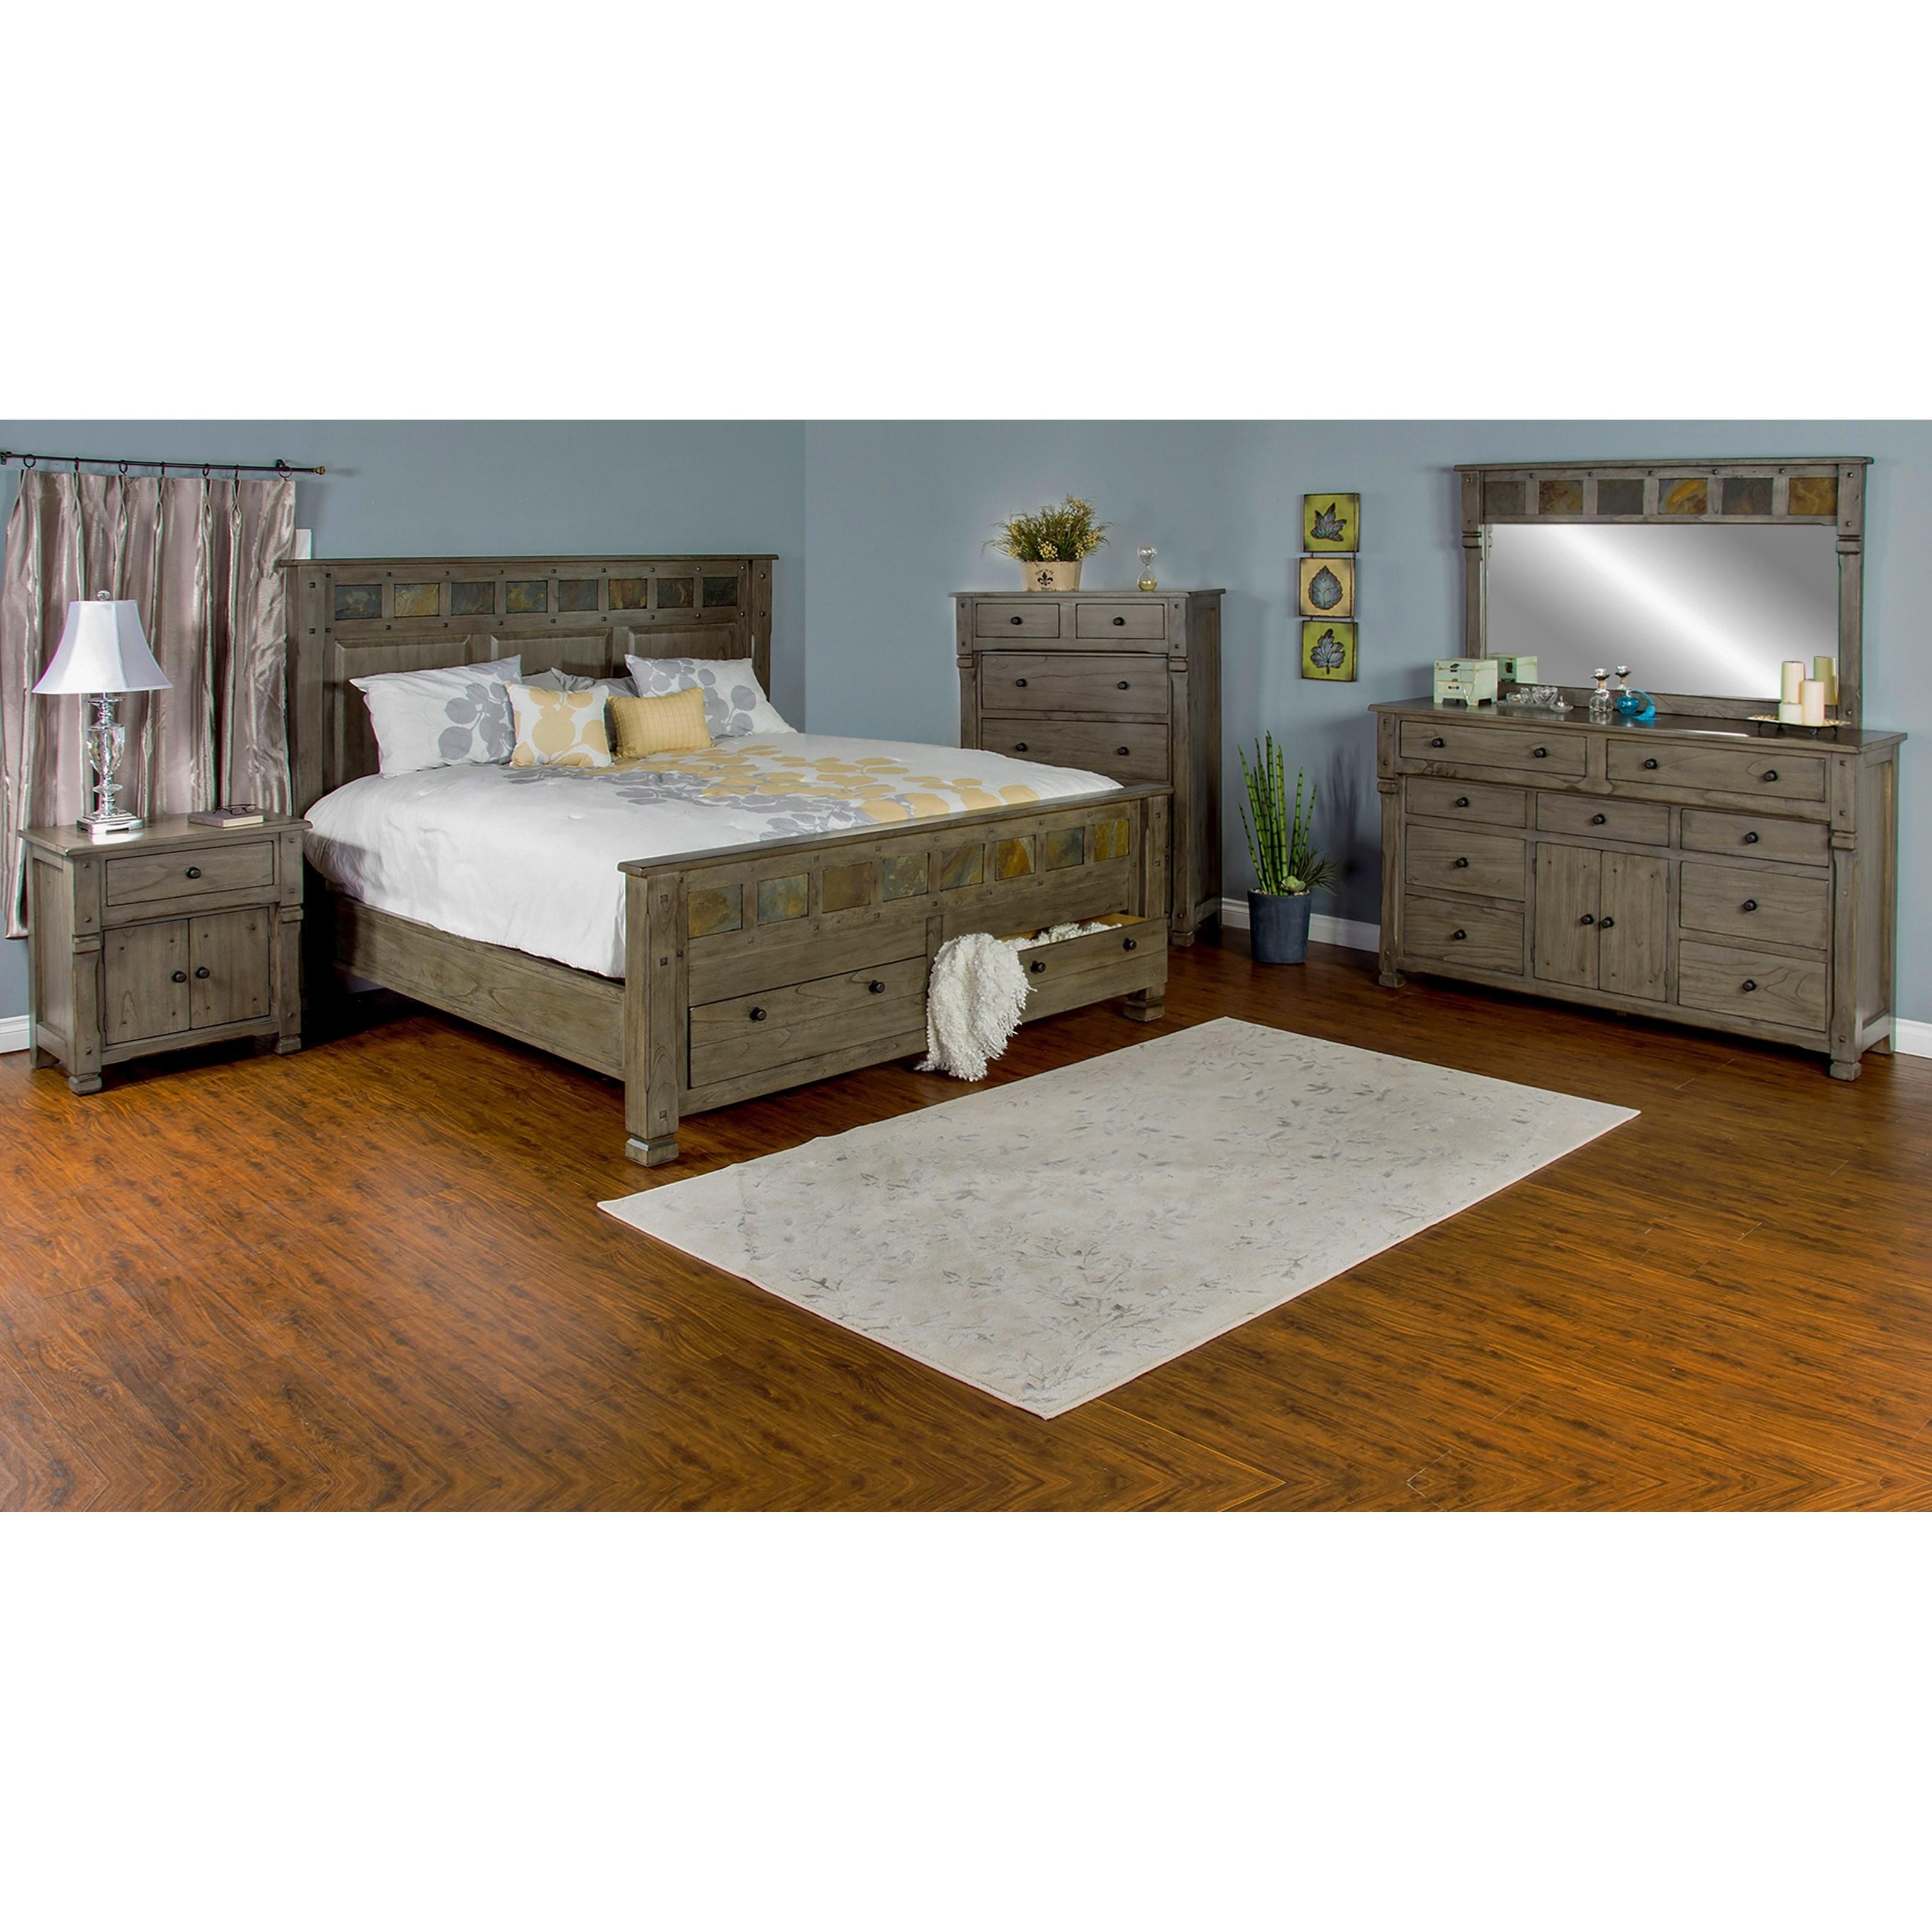 Sunny designs scottsdale dresser fashion furniture dressers for Sunny designs bedroom furniture